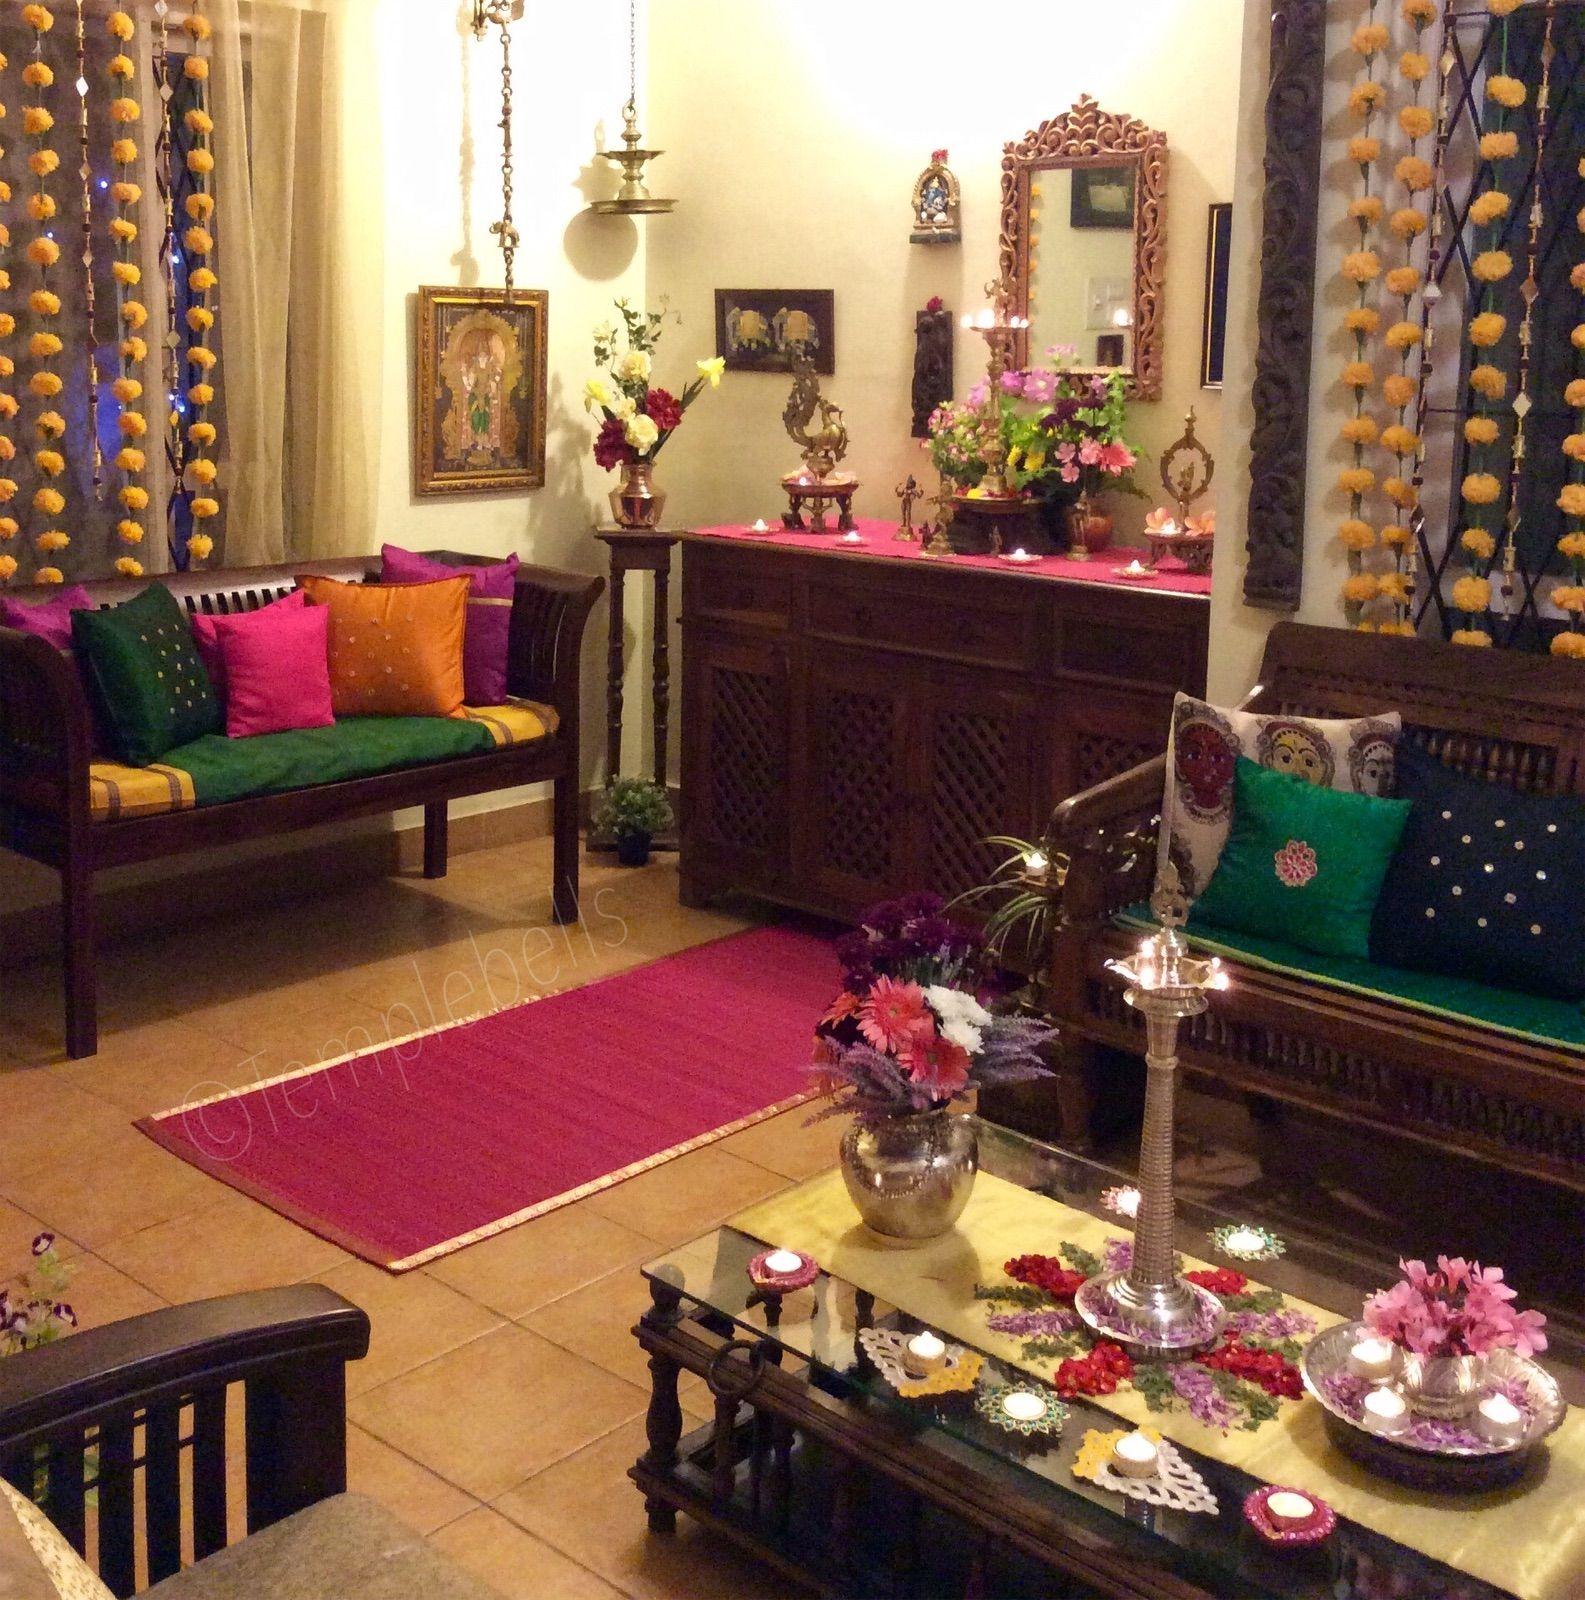 Diwali Decor From My Home Studio Beautiful Decor Decor Indian